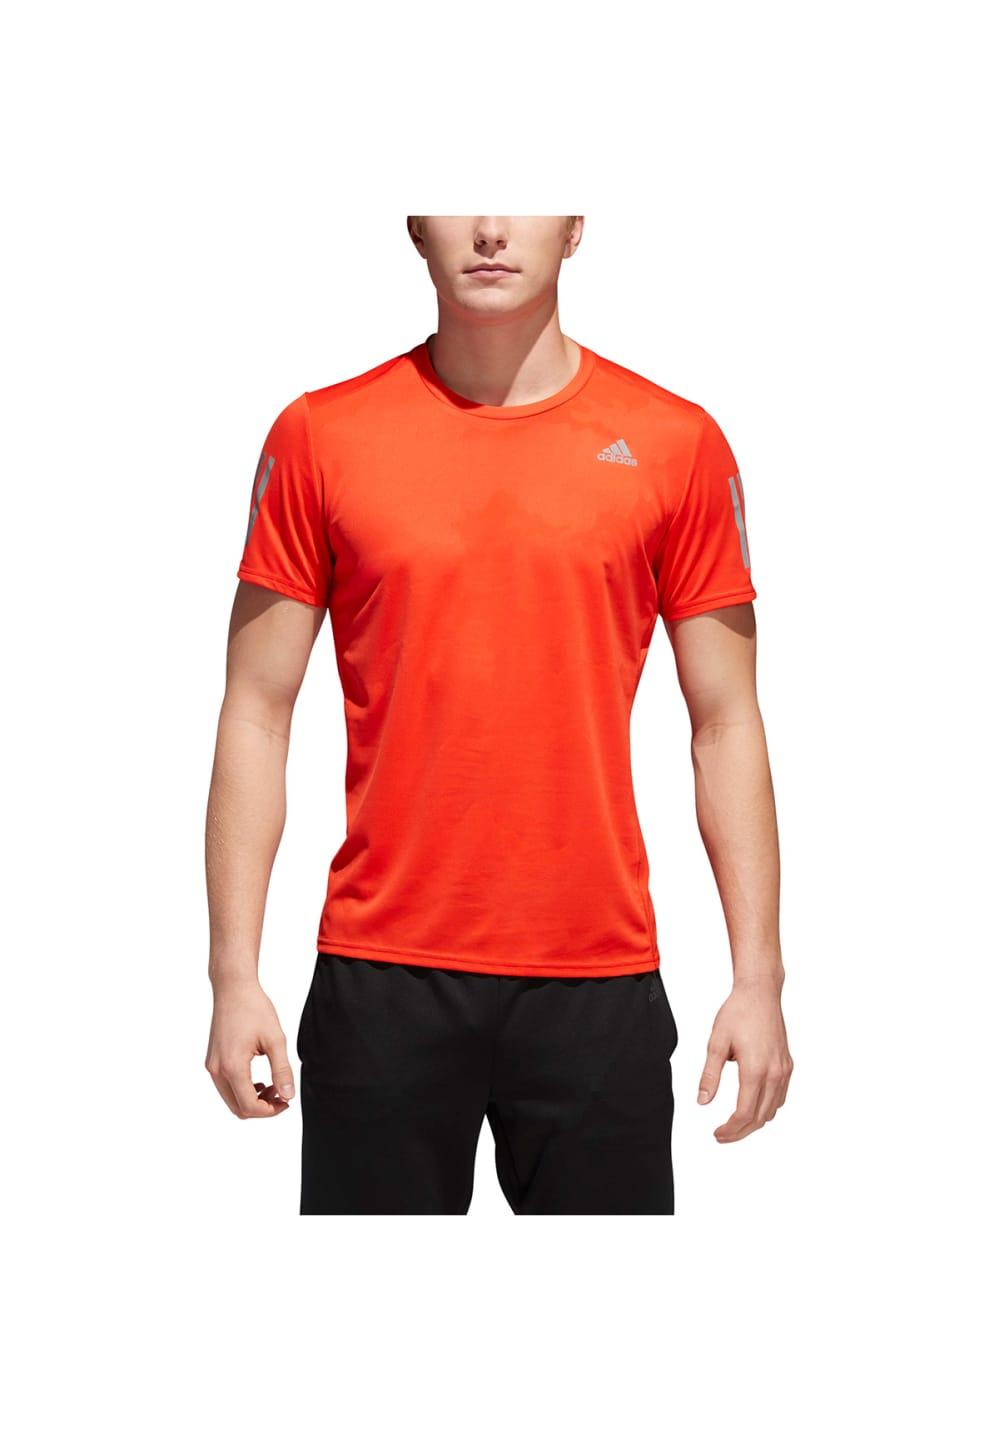 474338a498b7f adidas Response Short Sleeve Tee Men - Running tops for Men - Orange ...